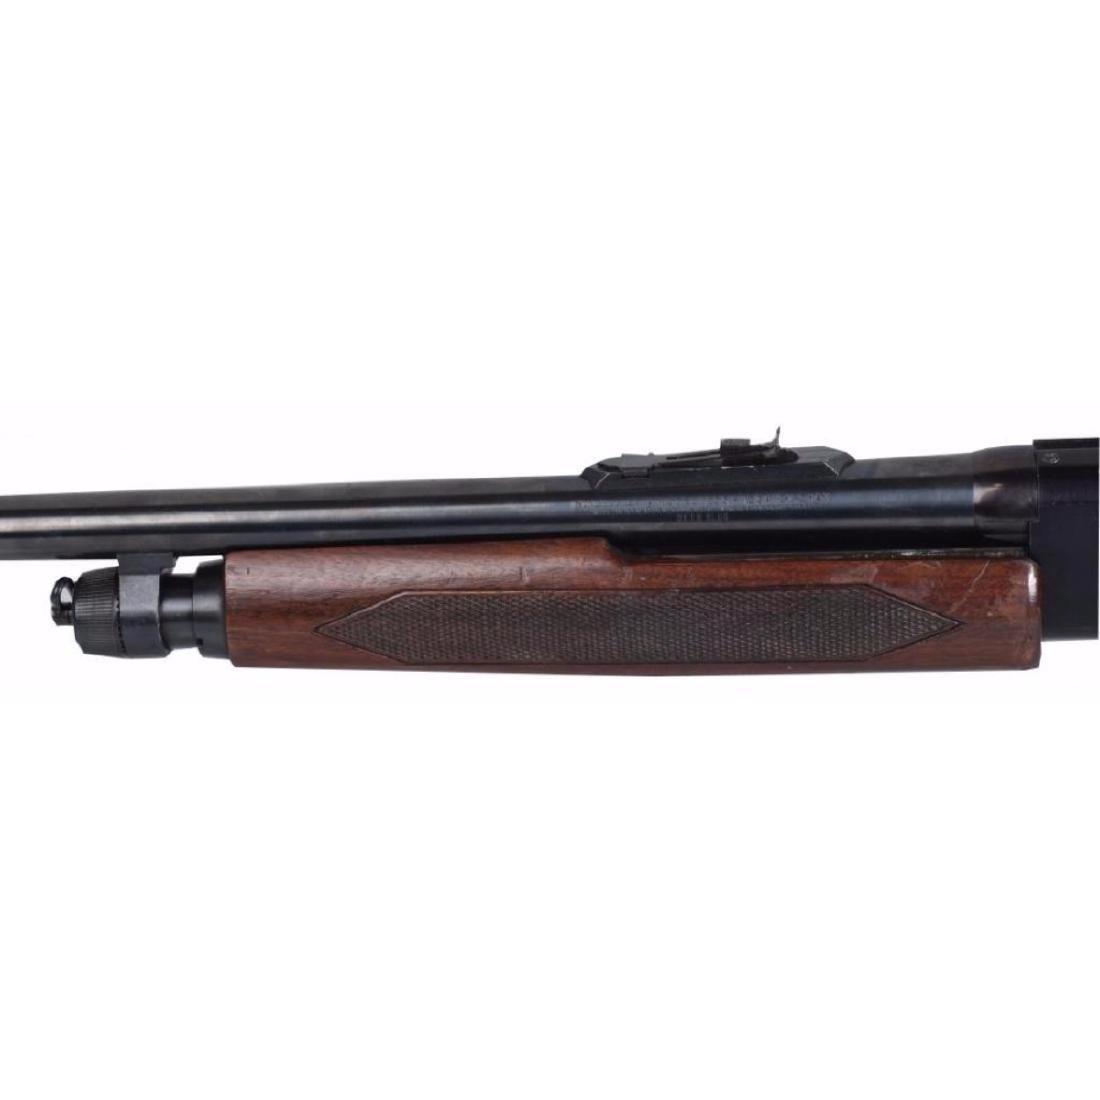 Winchester Model 1200 12 Ga Pump Shotgun - 6